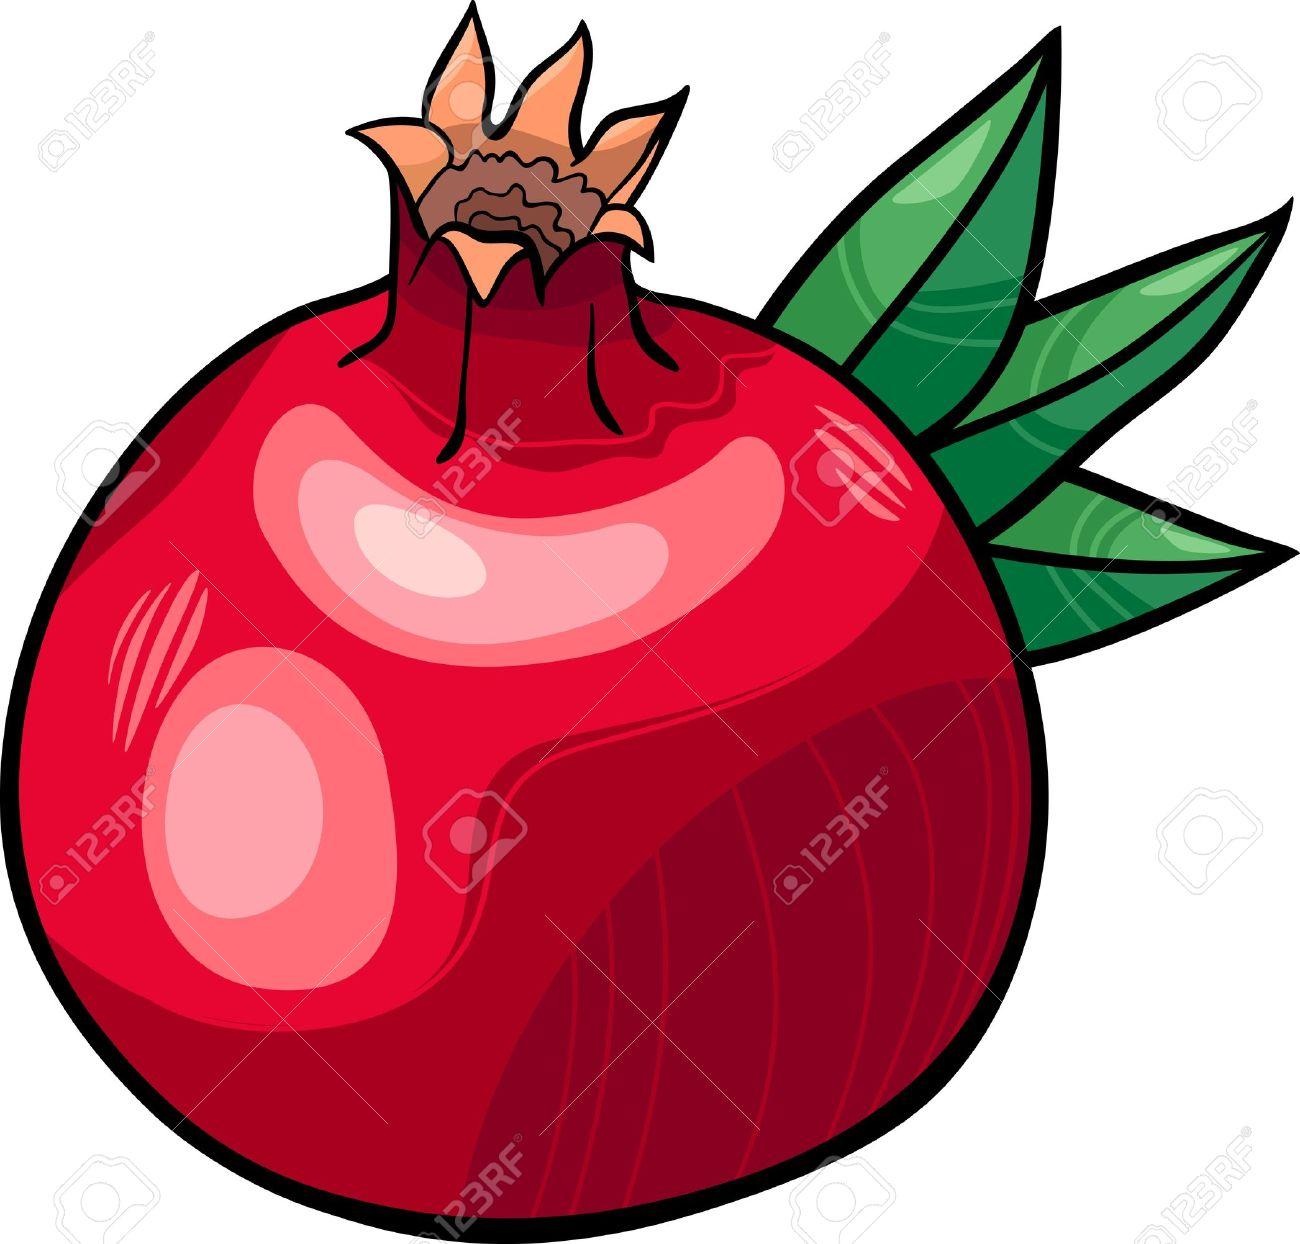 cartoon illustration of pomegranate fruit food object royalty free rh 123rf com pomegranate clipart pomegranate clipart free